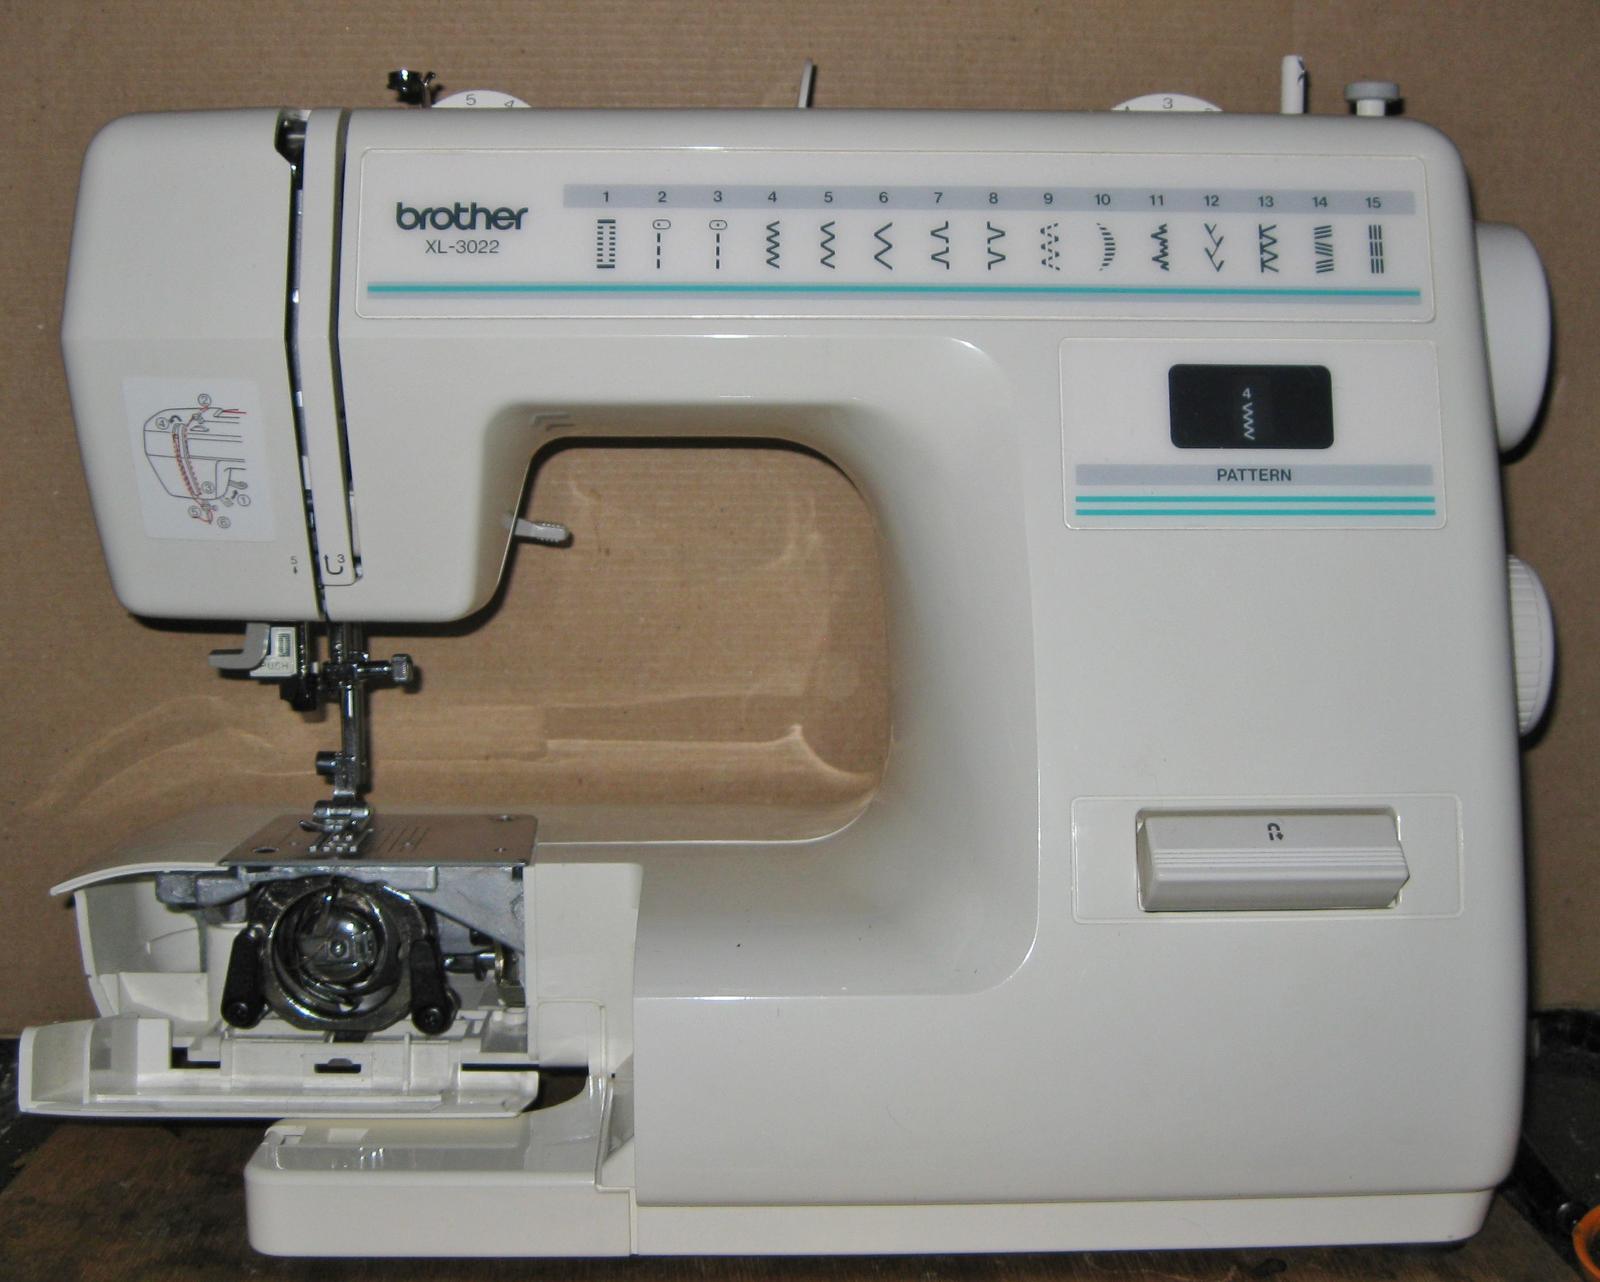 Brother XL-3022 Horizontal Spool Pin w/Spool and 50 similar